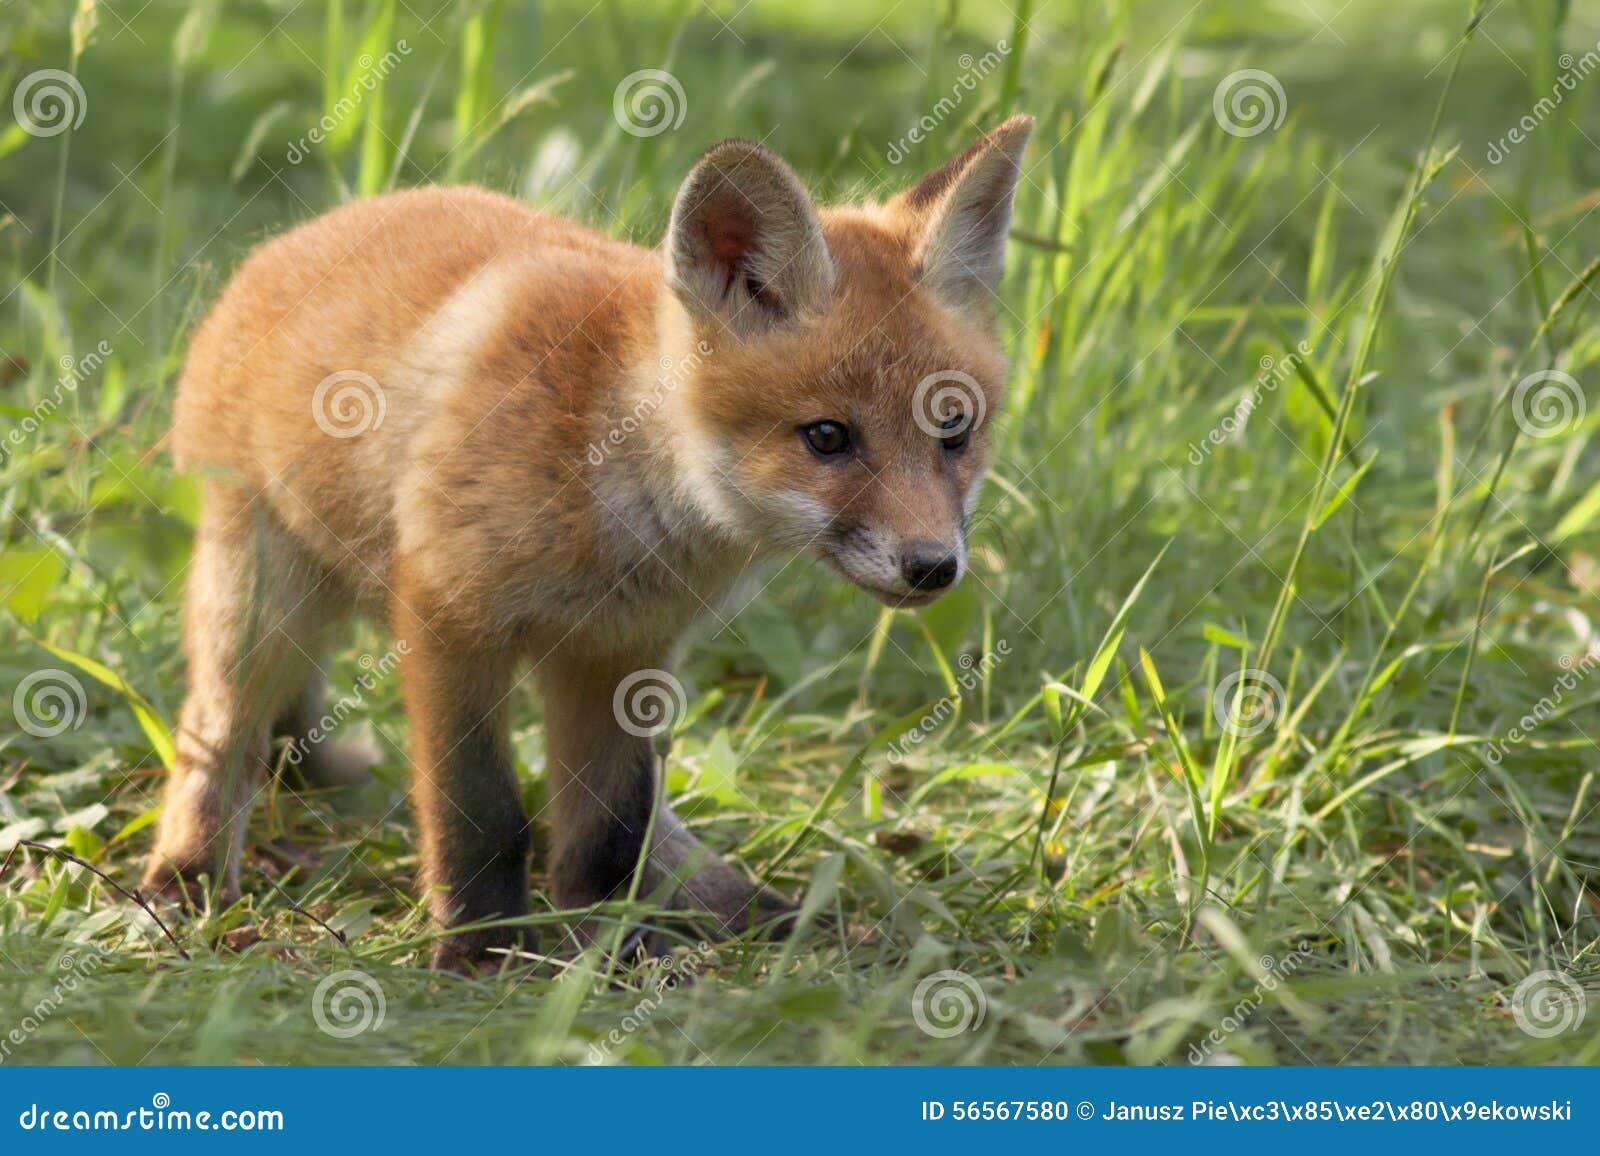 Download Αλεπού στις άγρια περιοχές στοκ εικόνες. εικόνα από θηλαστικά - 56567580